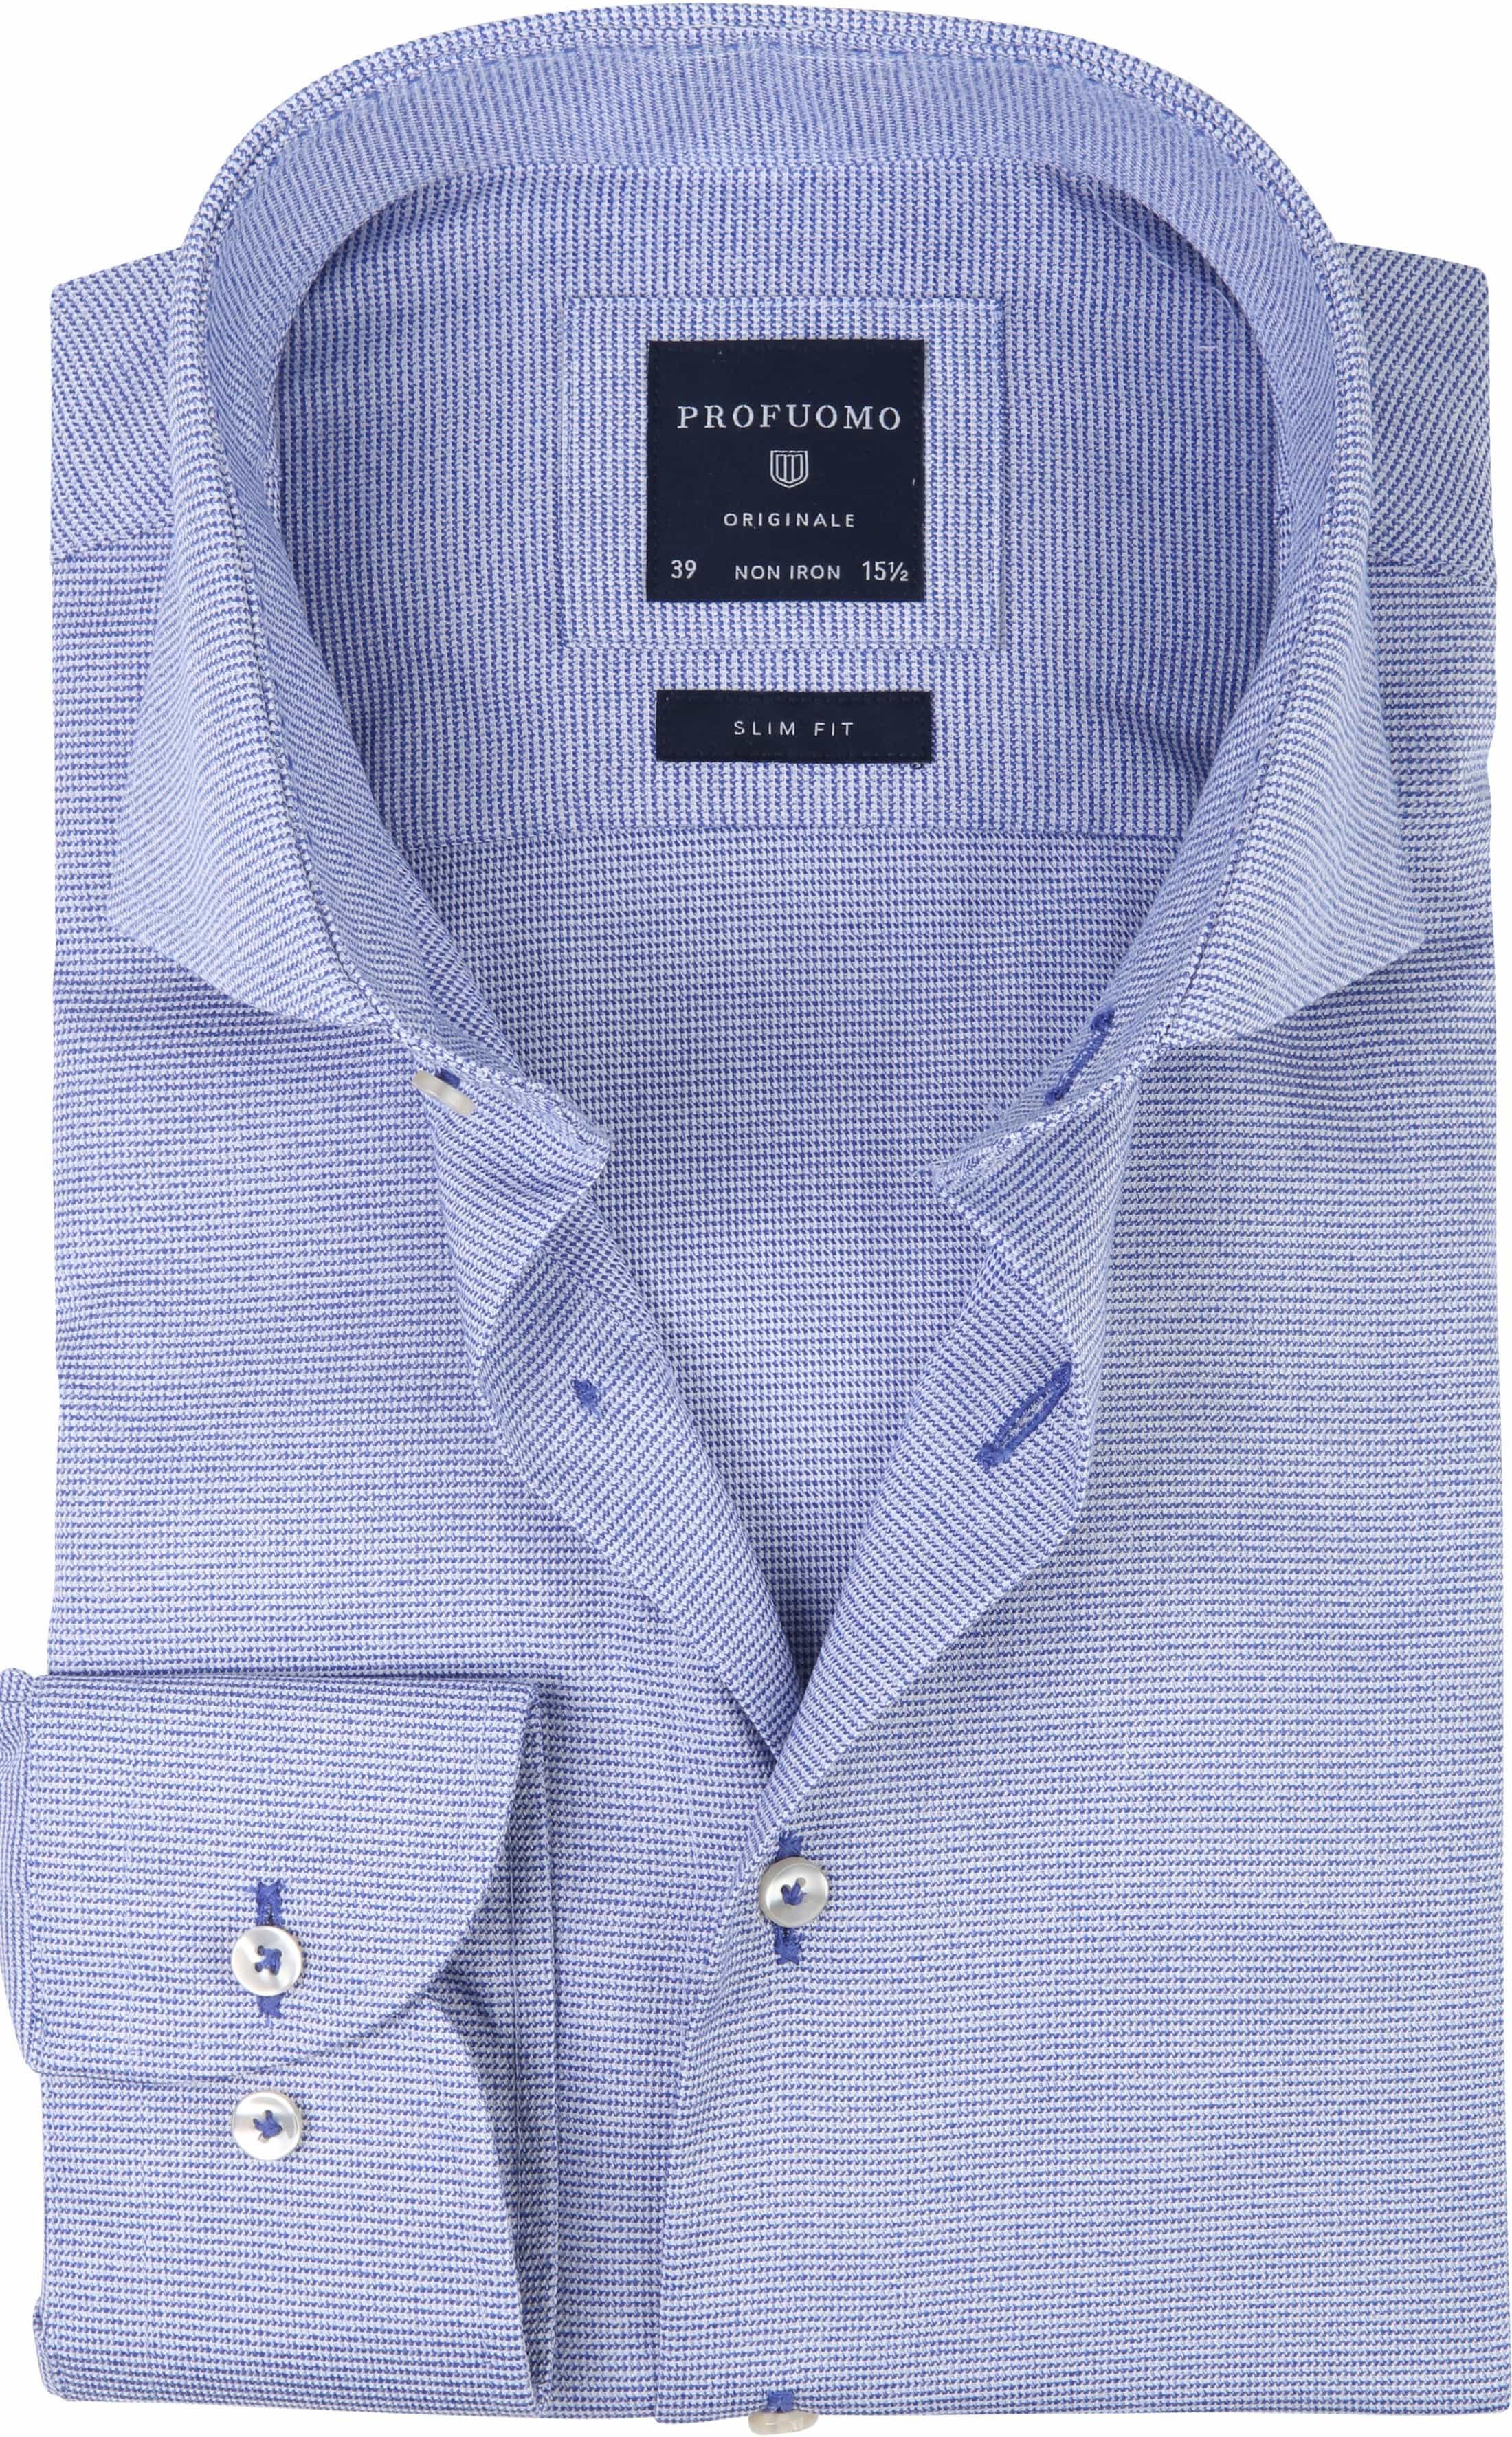 Profuomo Overhemd CAW PDP Blauw foto 0